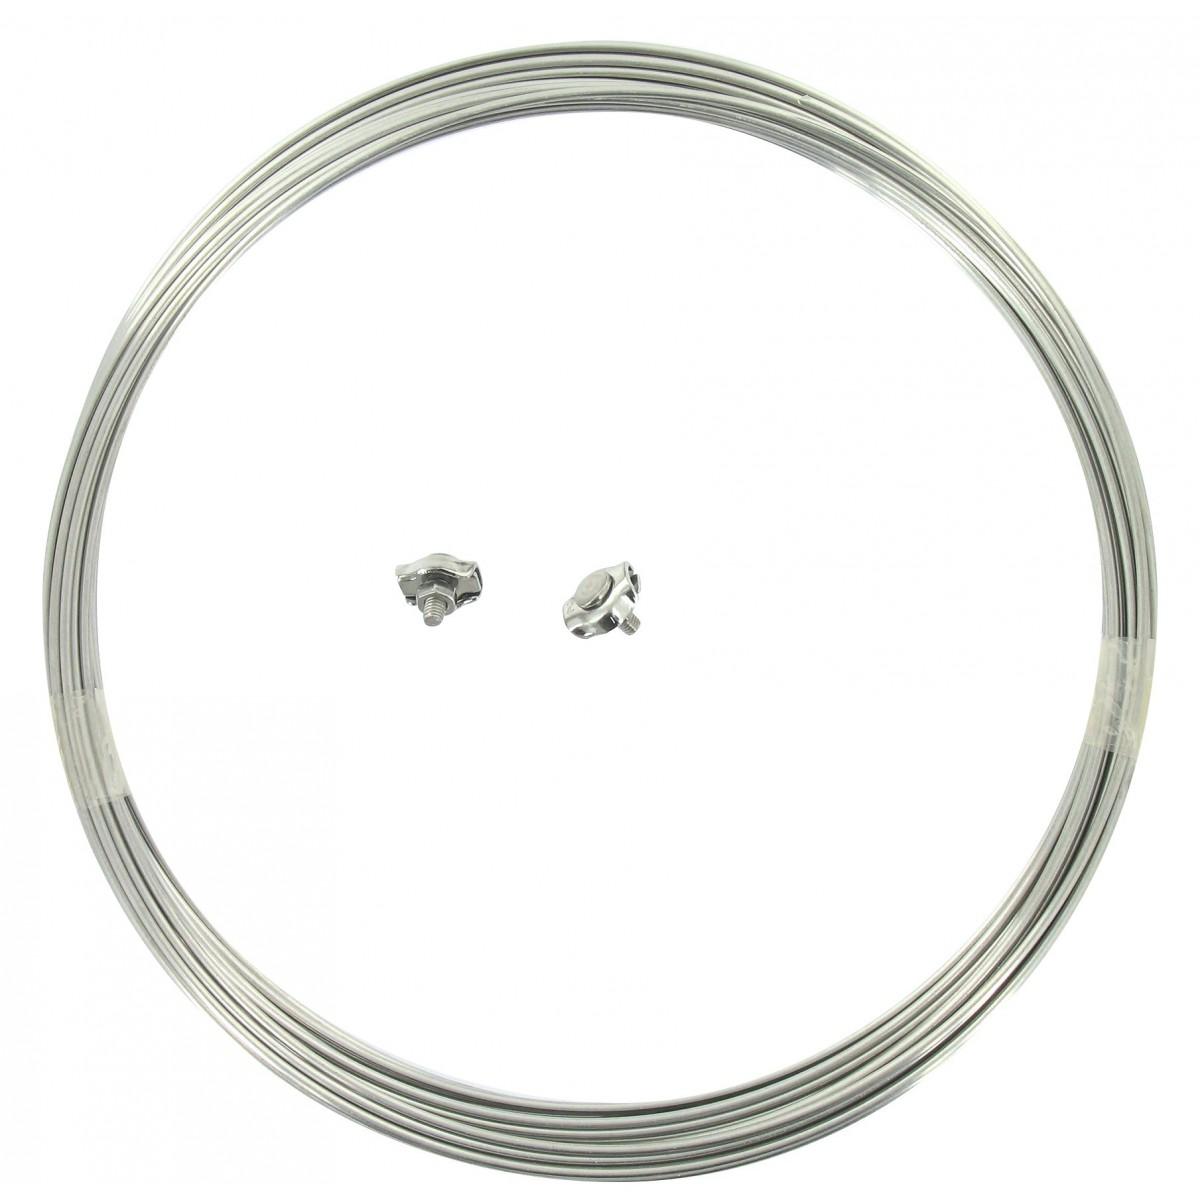 Corde à linge - Acier inox - Diamètre 2 mm